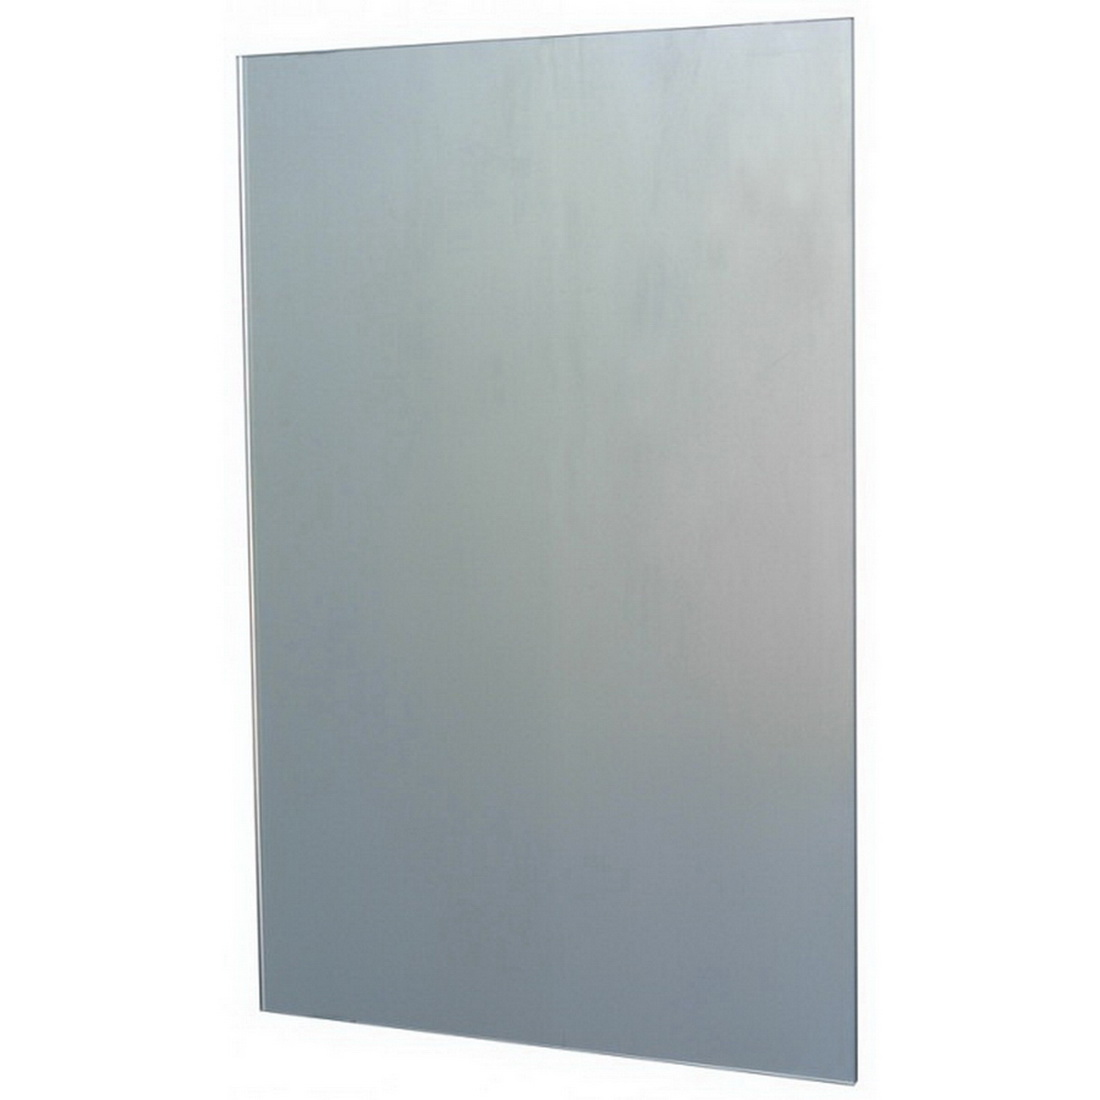 Styline Polished Edge Mirror 600 x 400mm 6X4STYLE